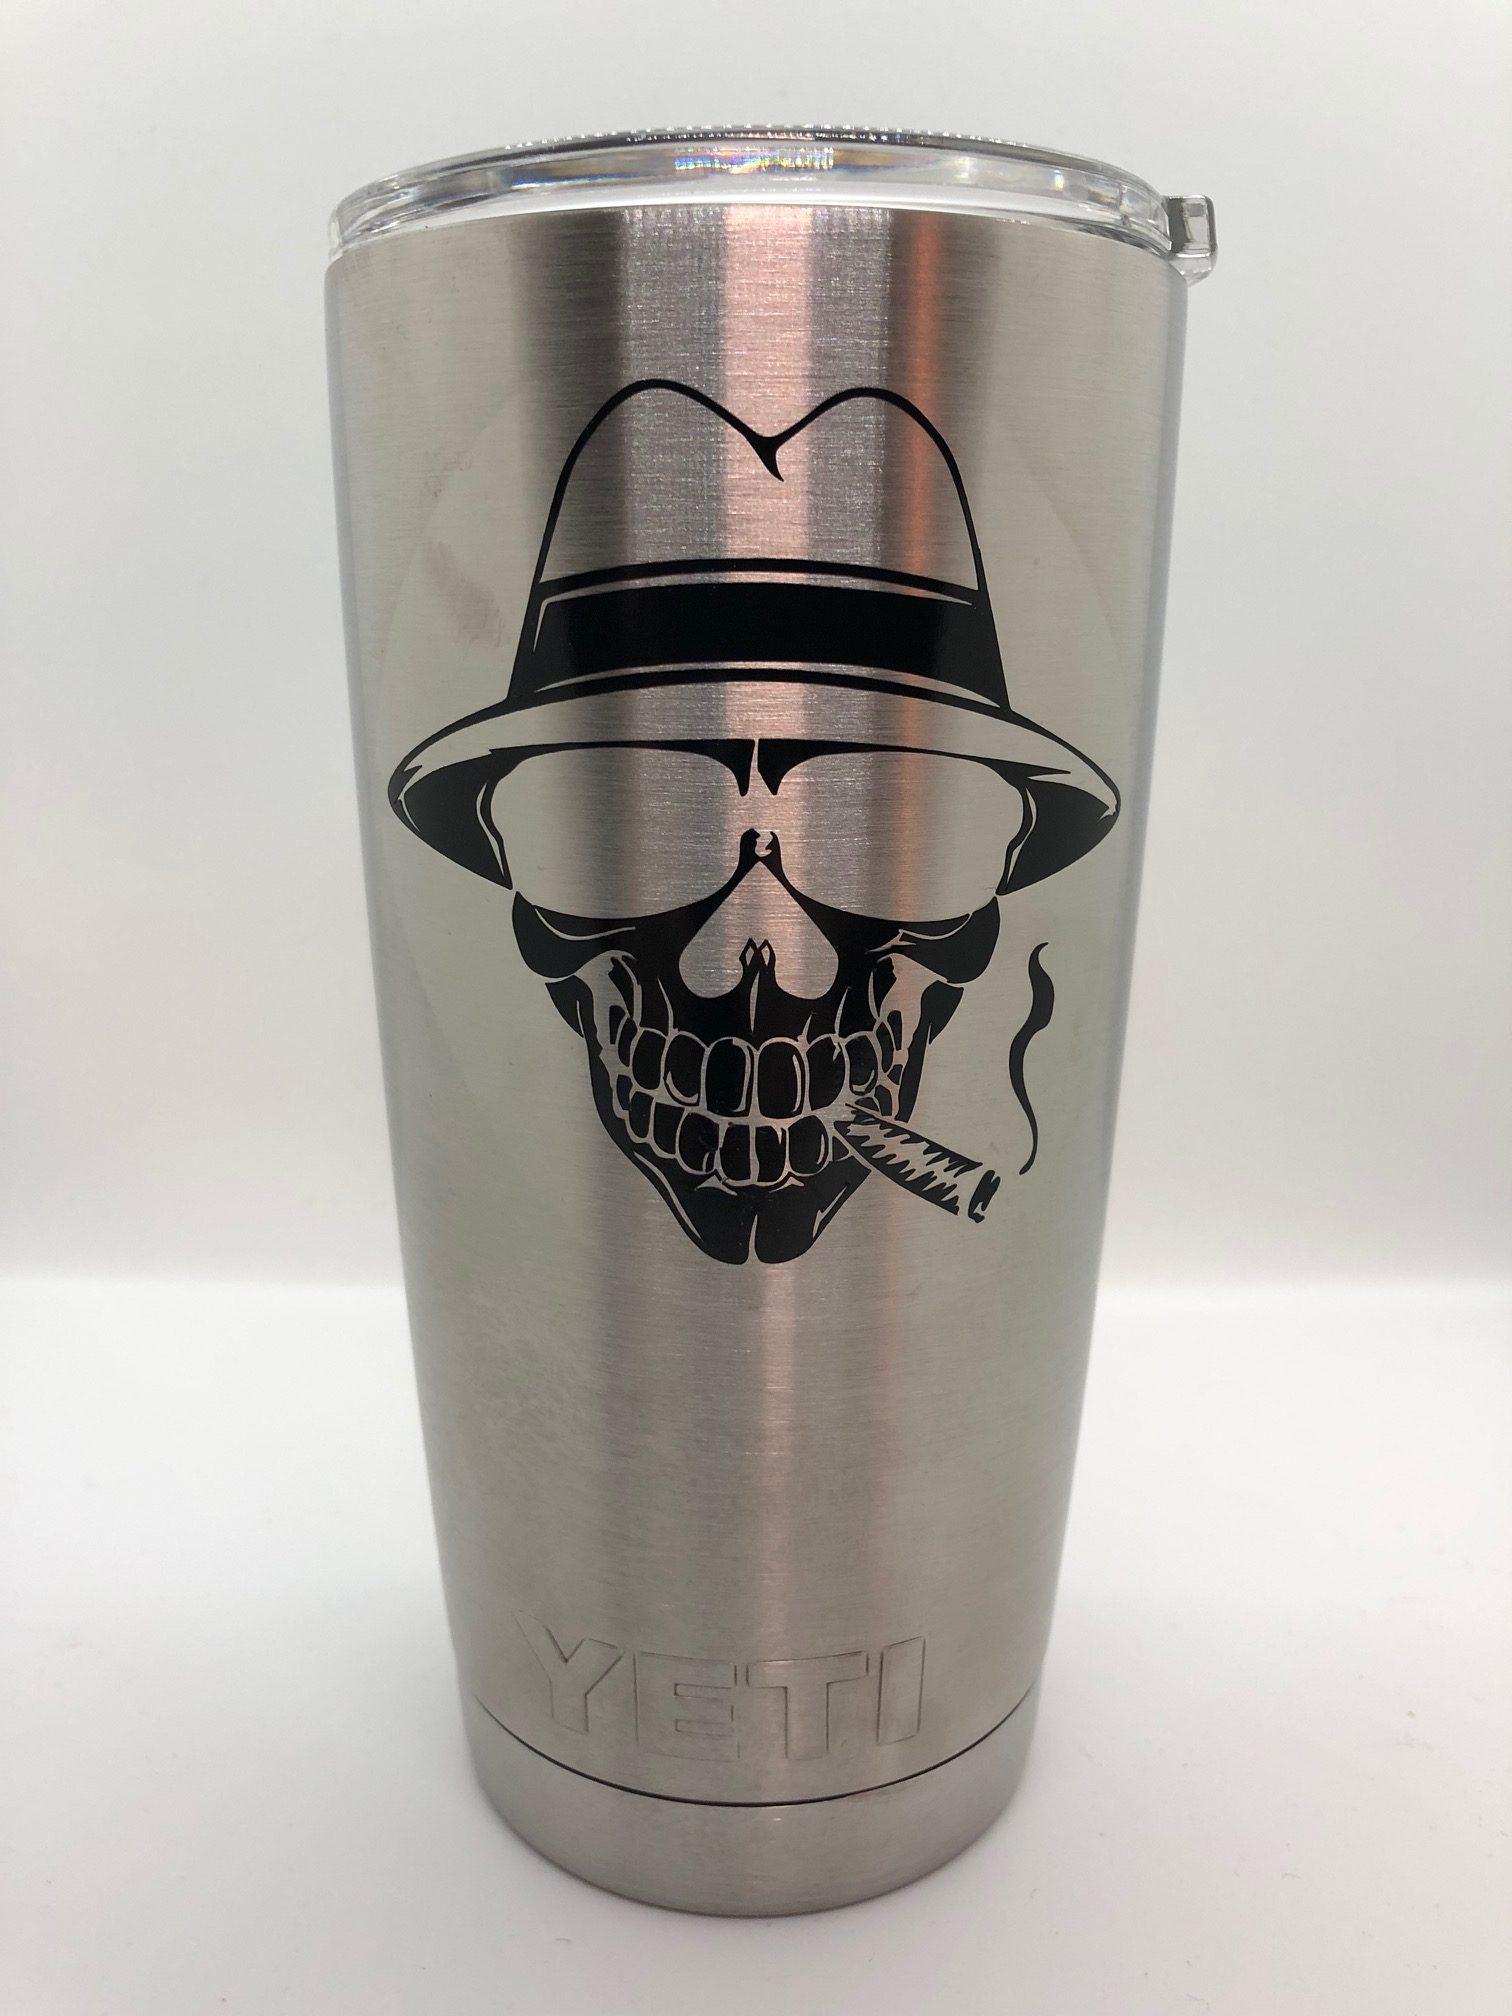 Yeti Cup (6 Styles)